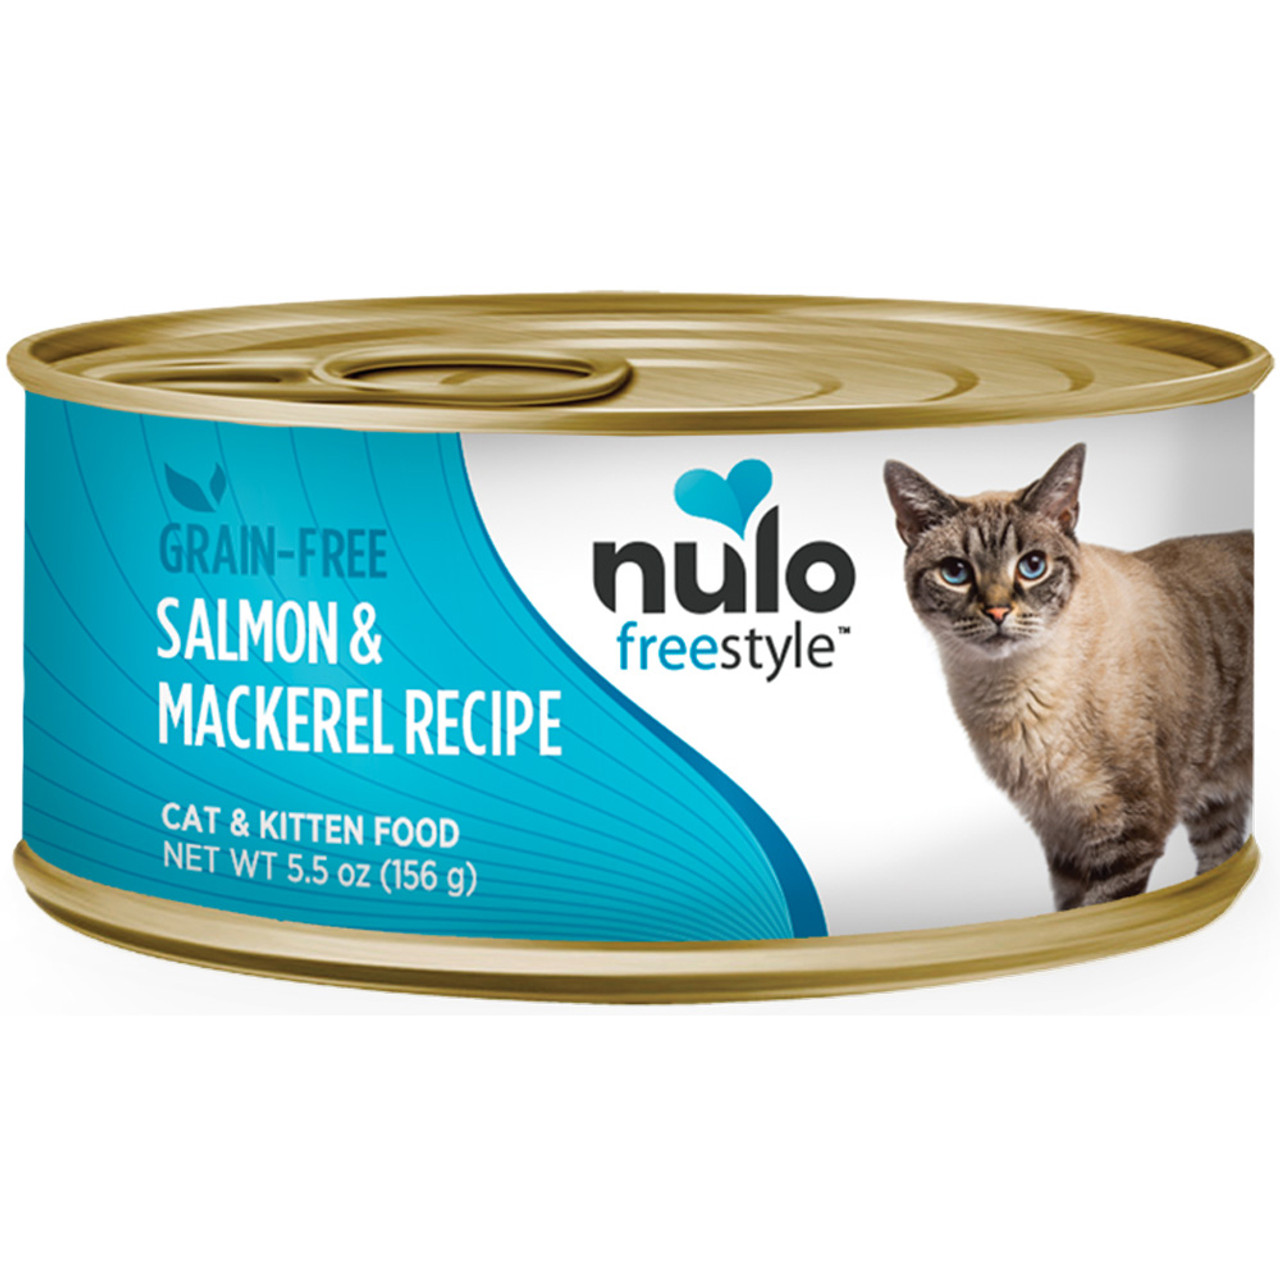 Nulo Freestyle Cat & Kitten Salmon & Mackerel Recipe Canned Cat Food